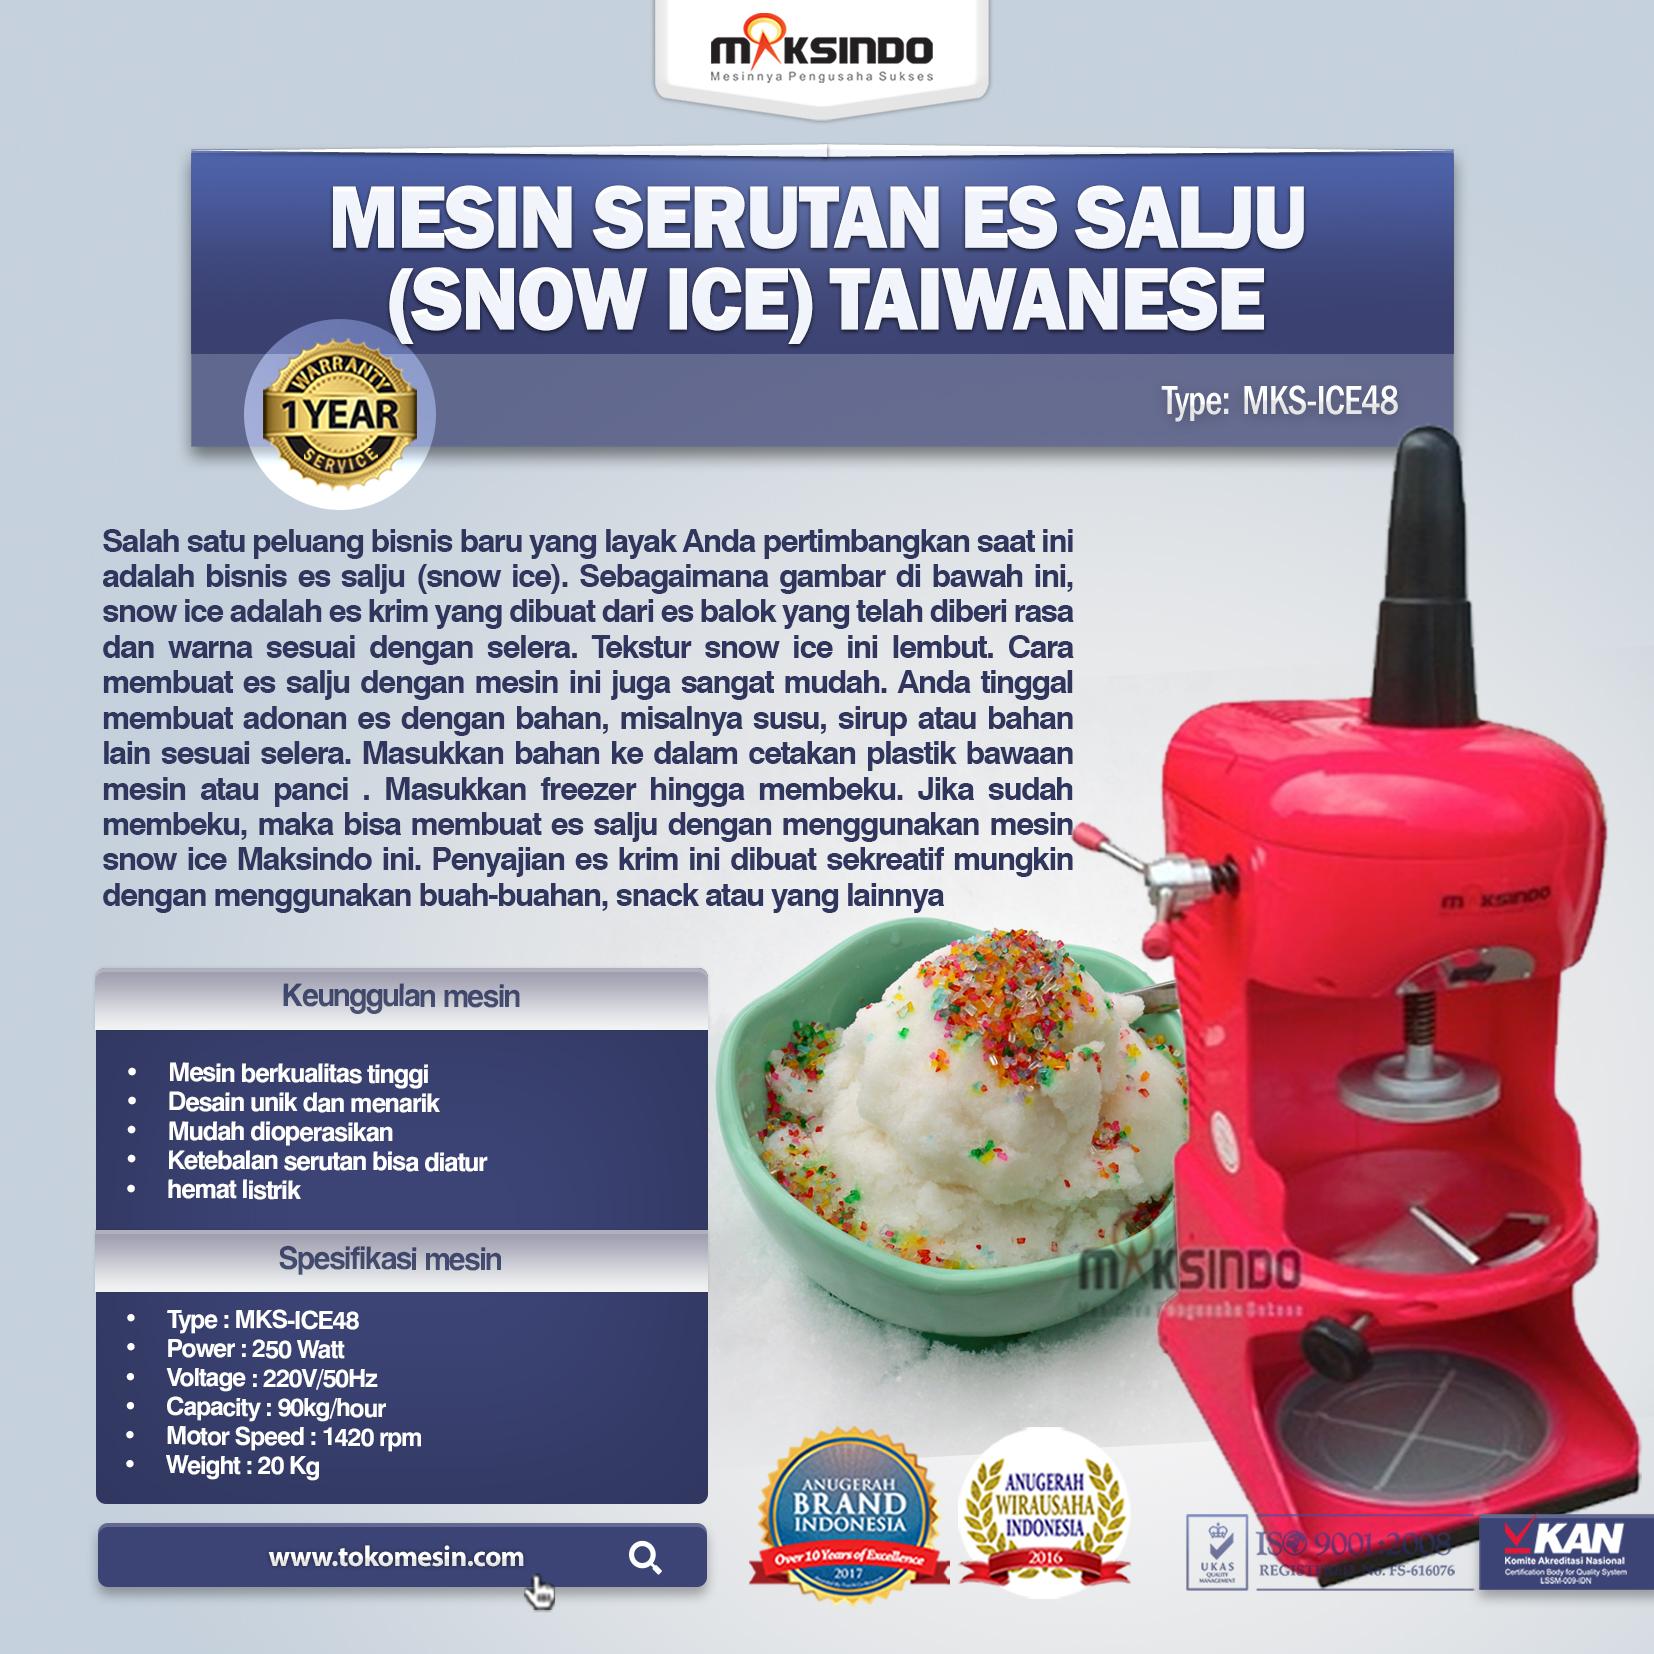 Mesin Serutan Es Salju (Snow Ice) Taiwanese MKS-ICE28